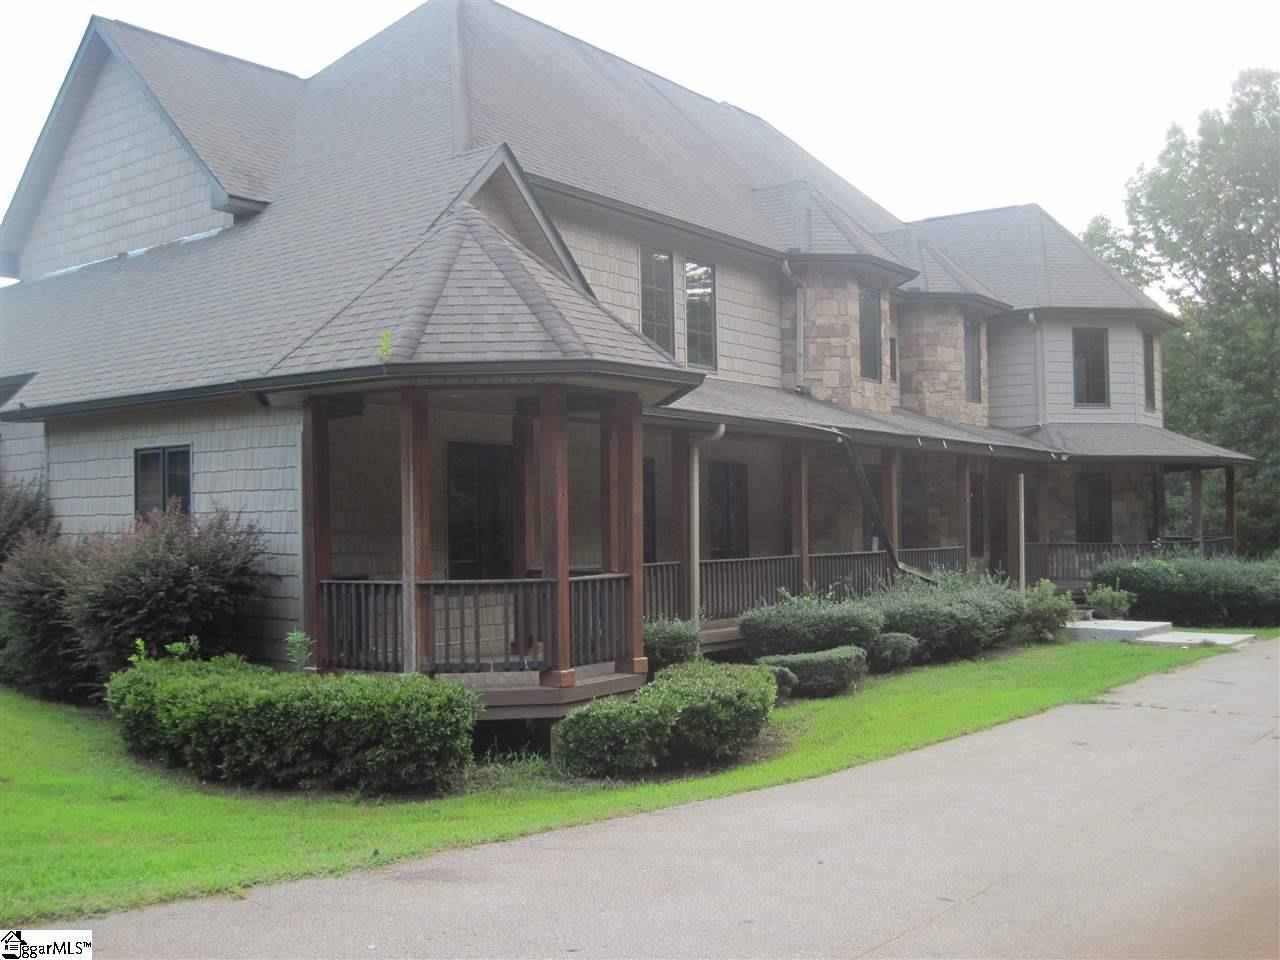 1780 Jackson Hollow Travelers Rest, SC 29690